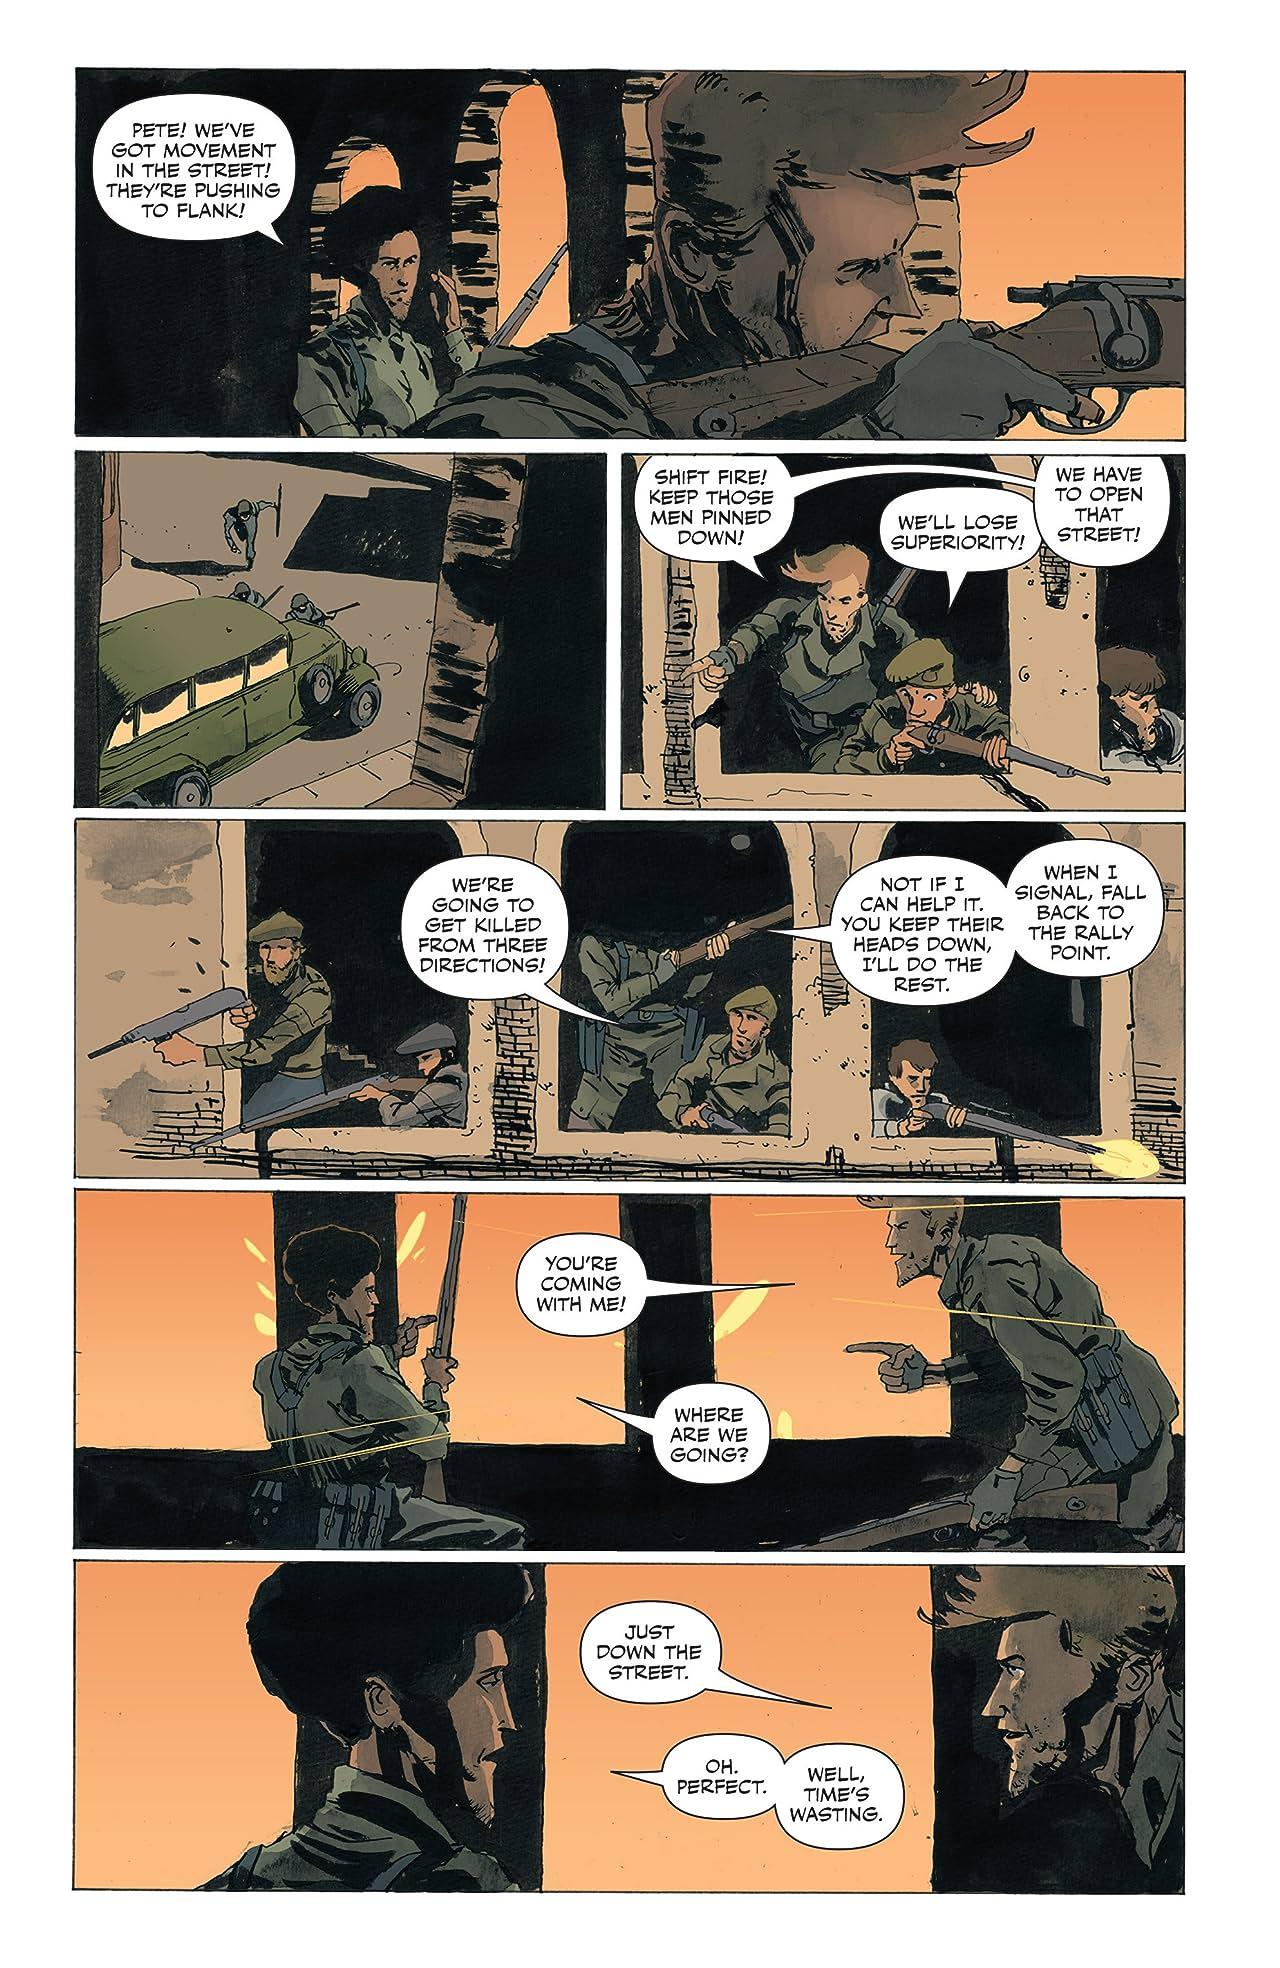 Peter Panzerfaust #20